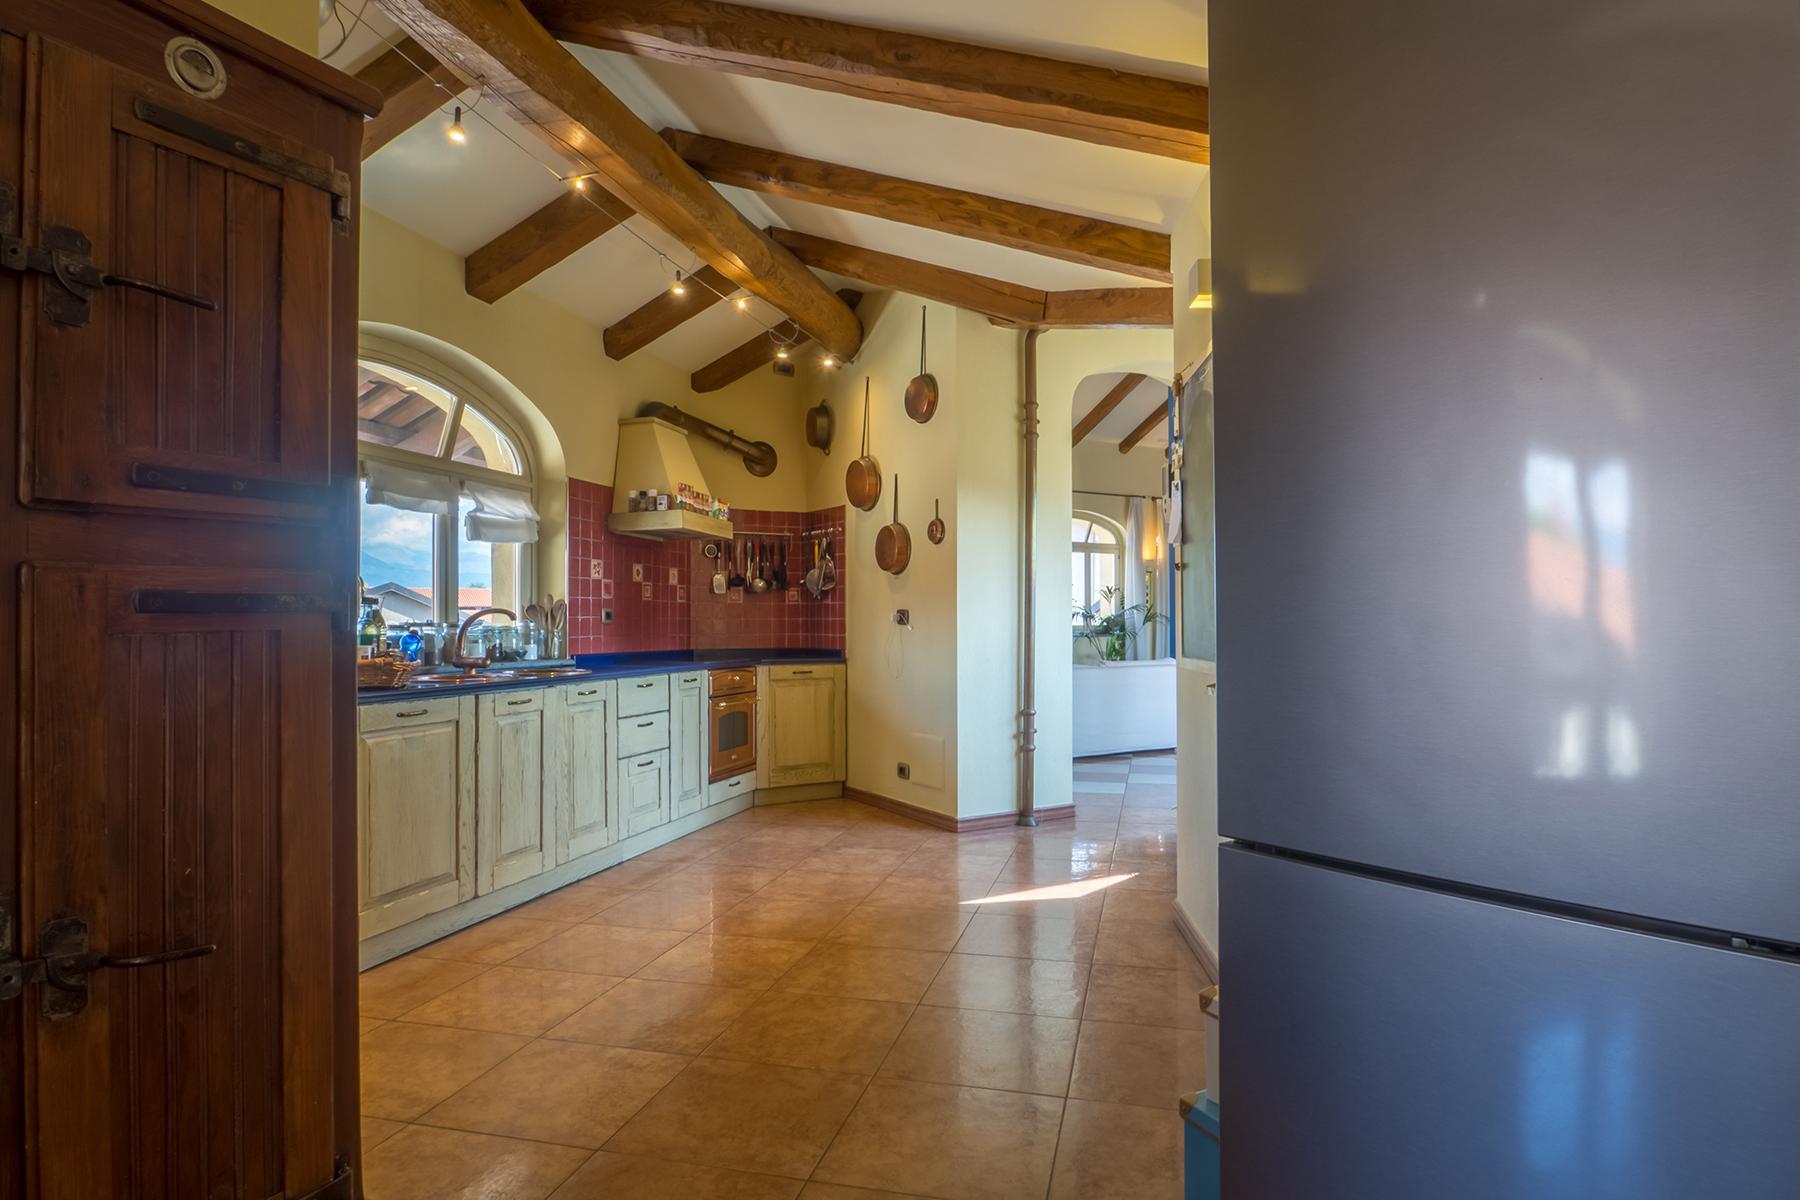 Elegant apartment in the Canavese region - 25